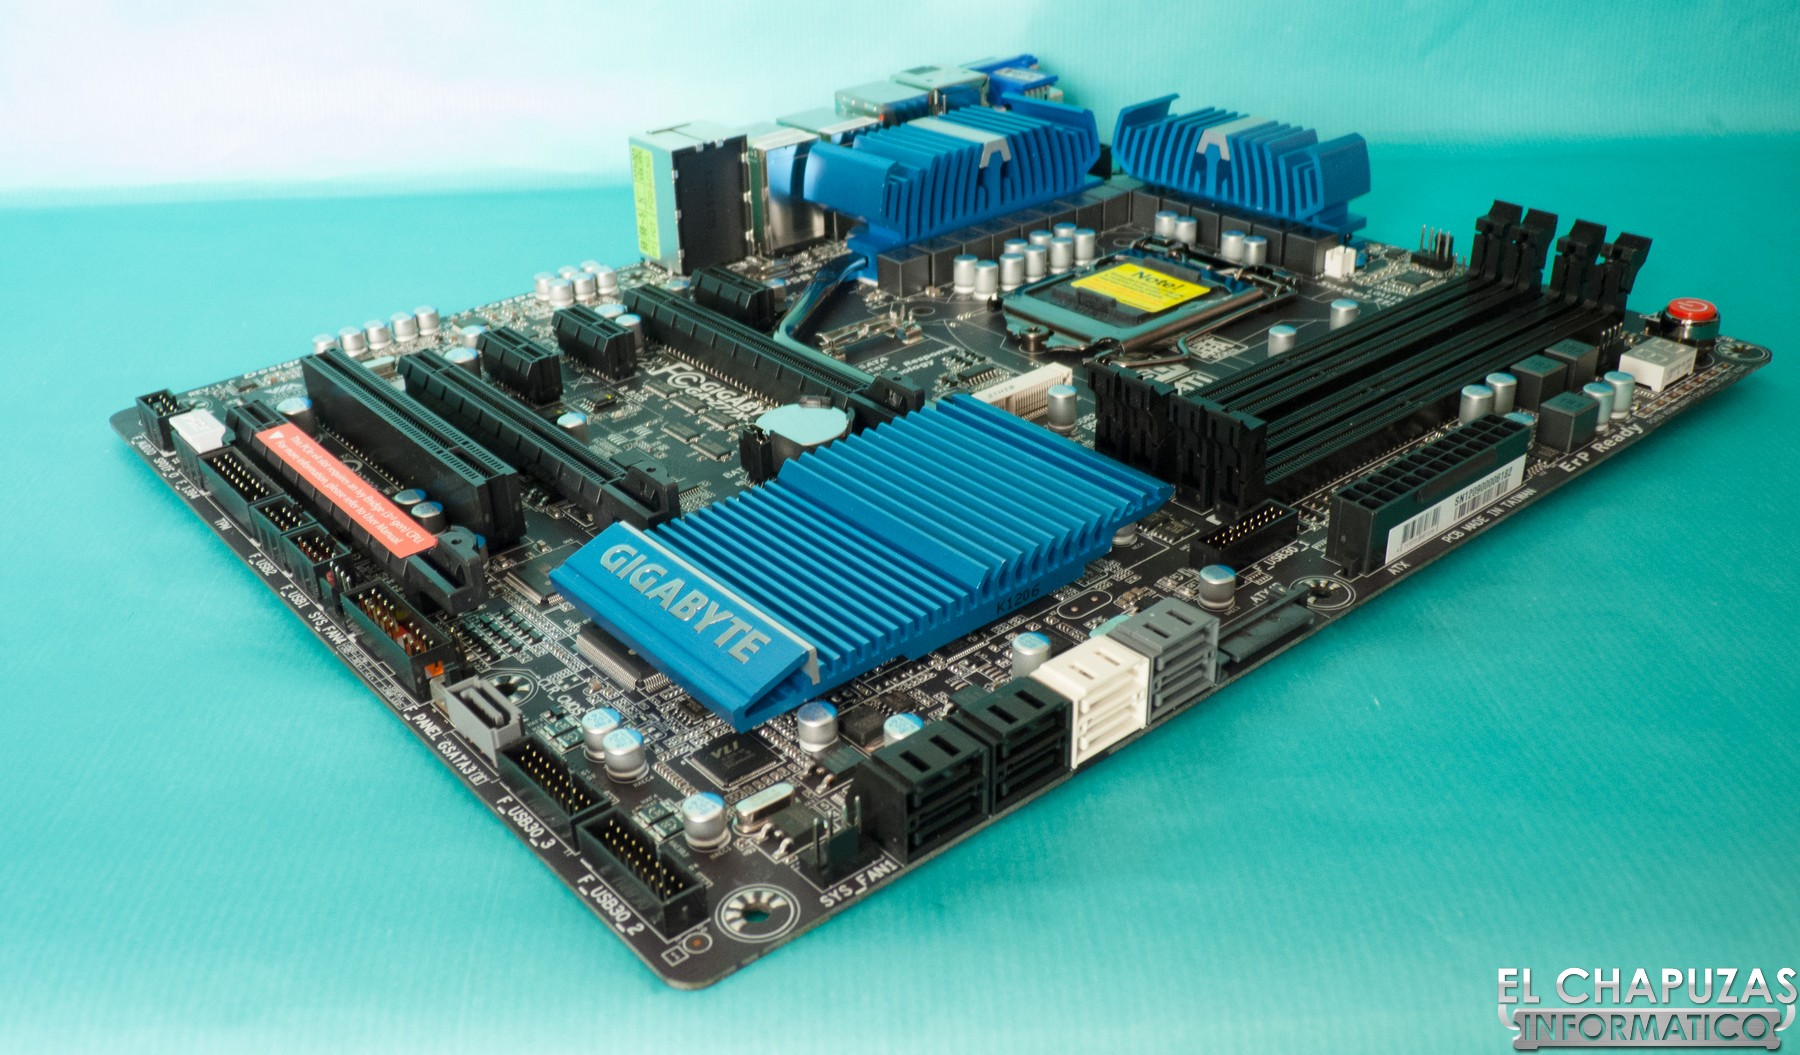 Review: Gigabyte GA-Z77X-UD5H